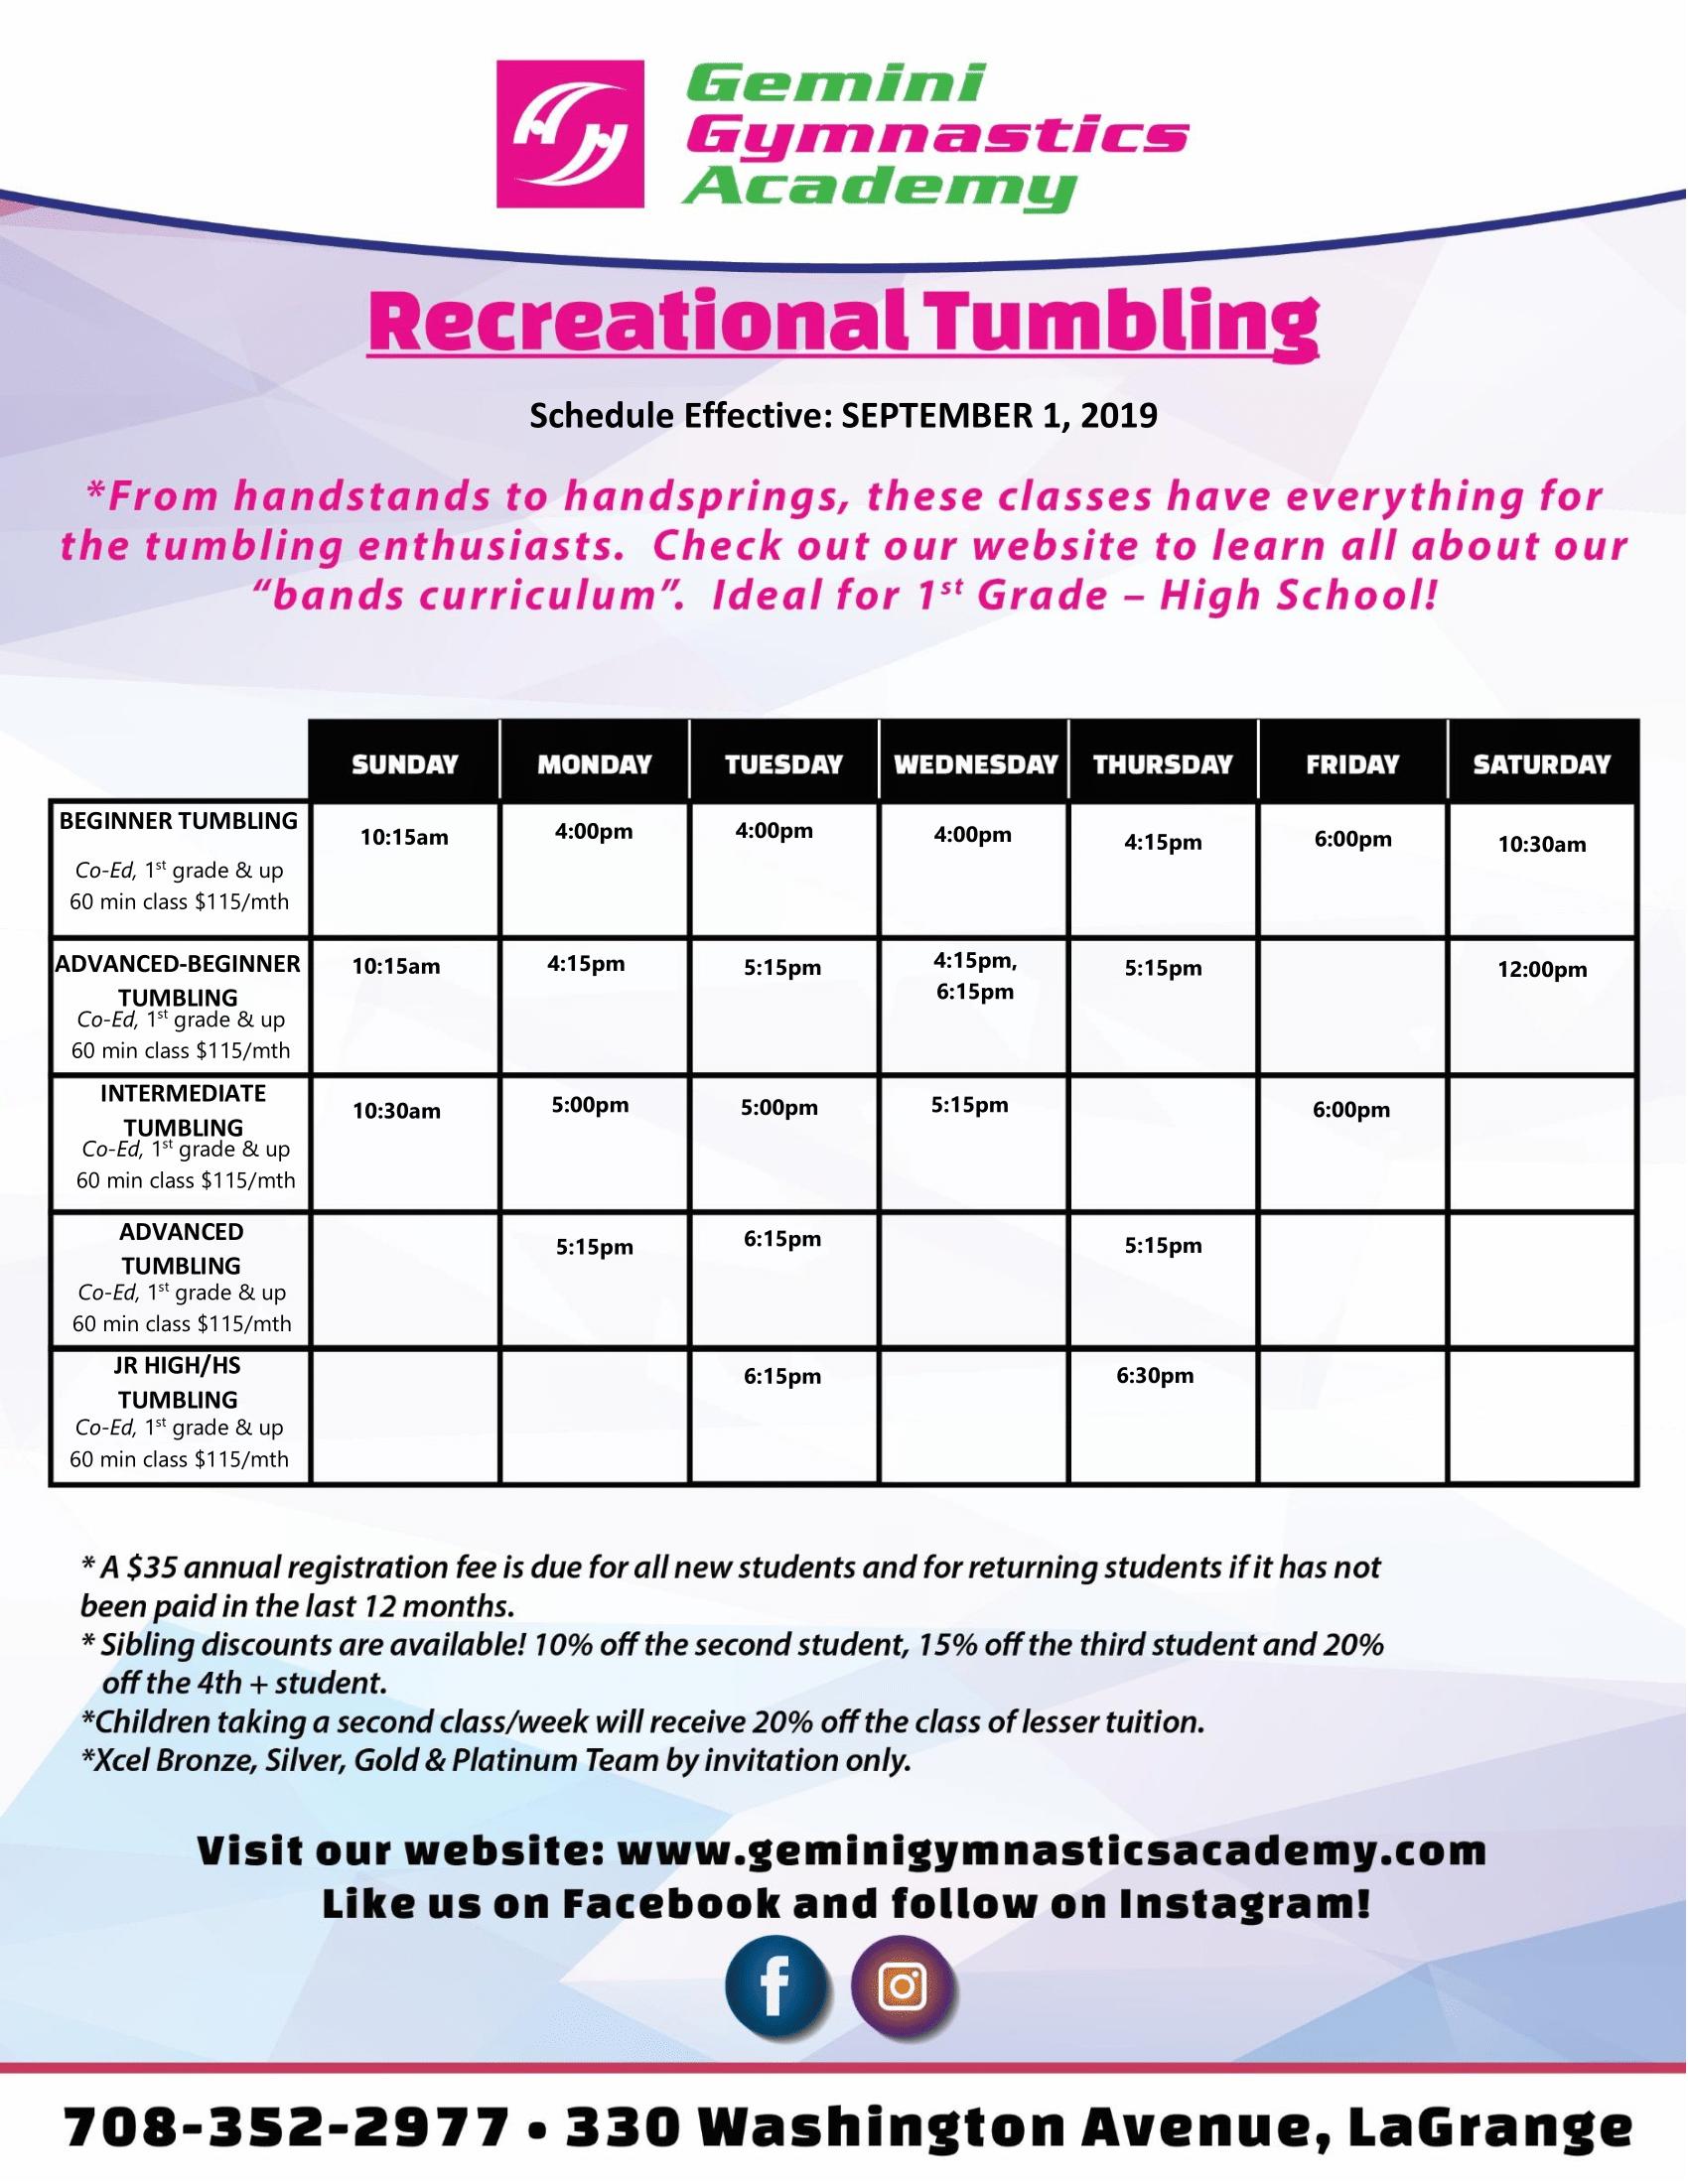 9_2019_Gemini Gymnastics_Recreational Tumbling_Schedule_-1